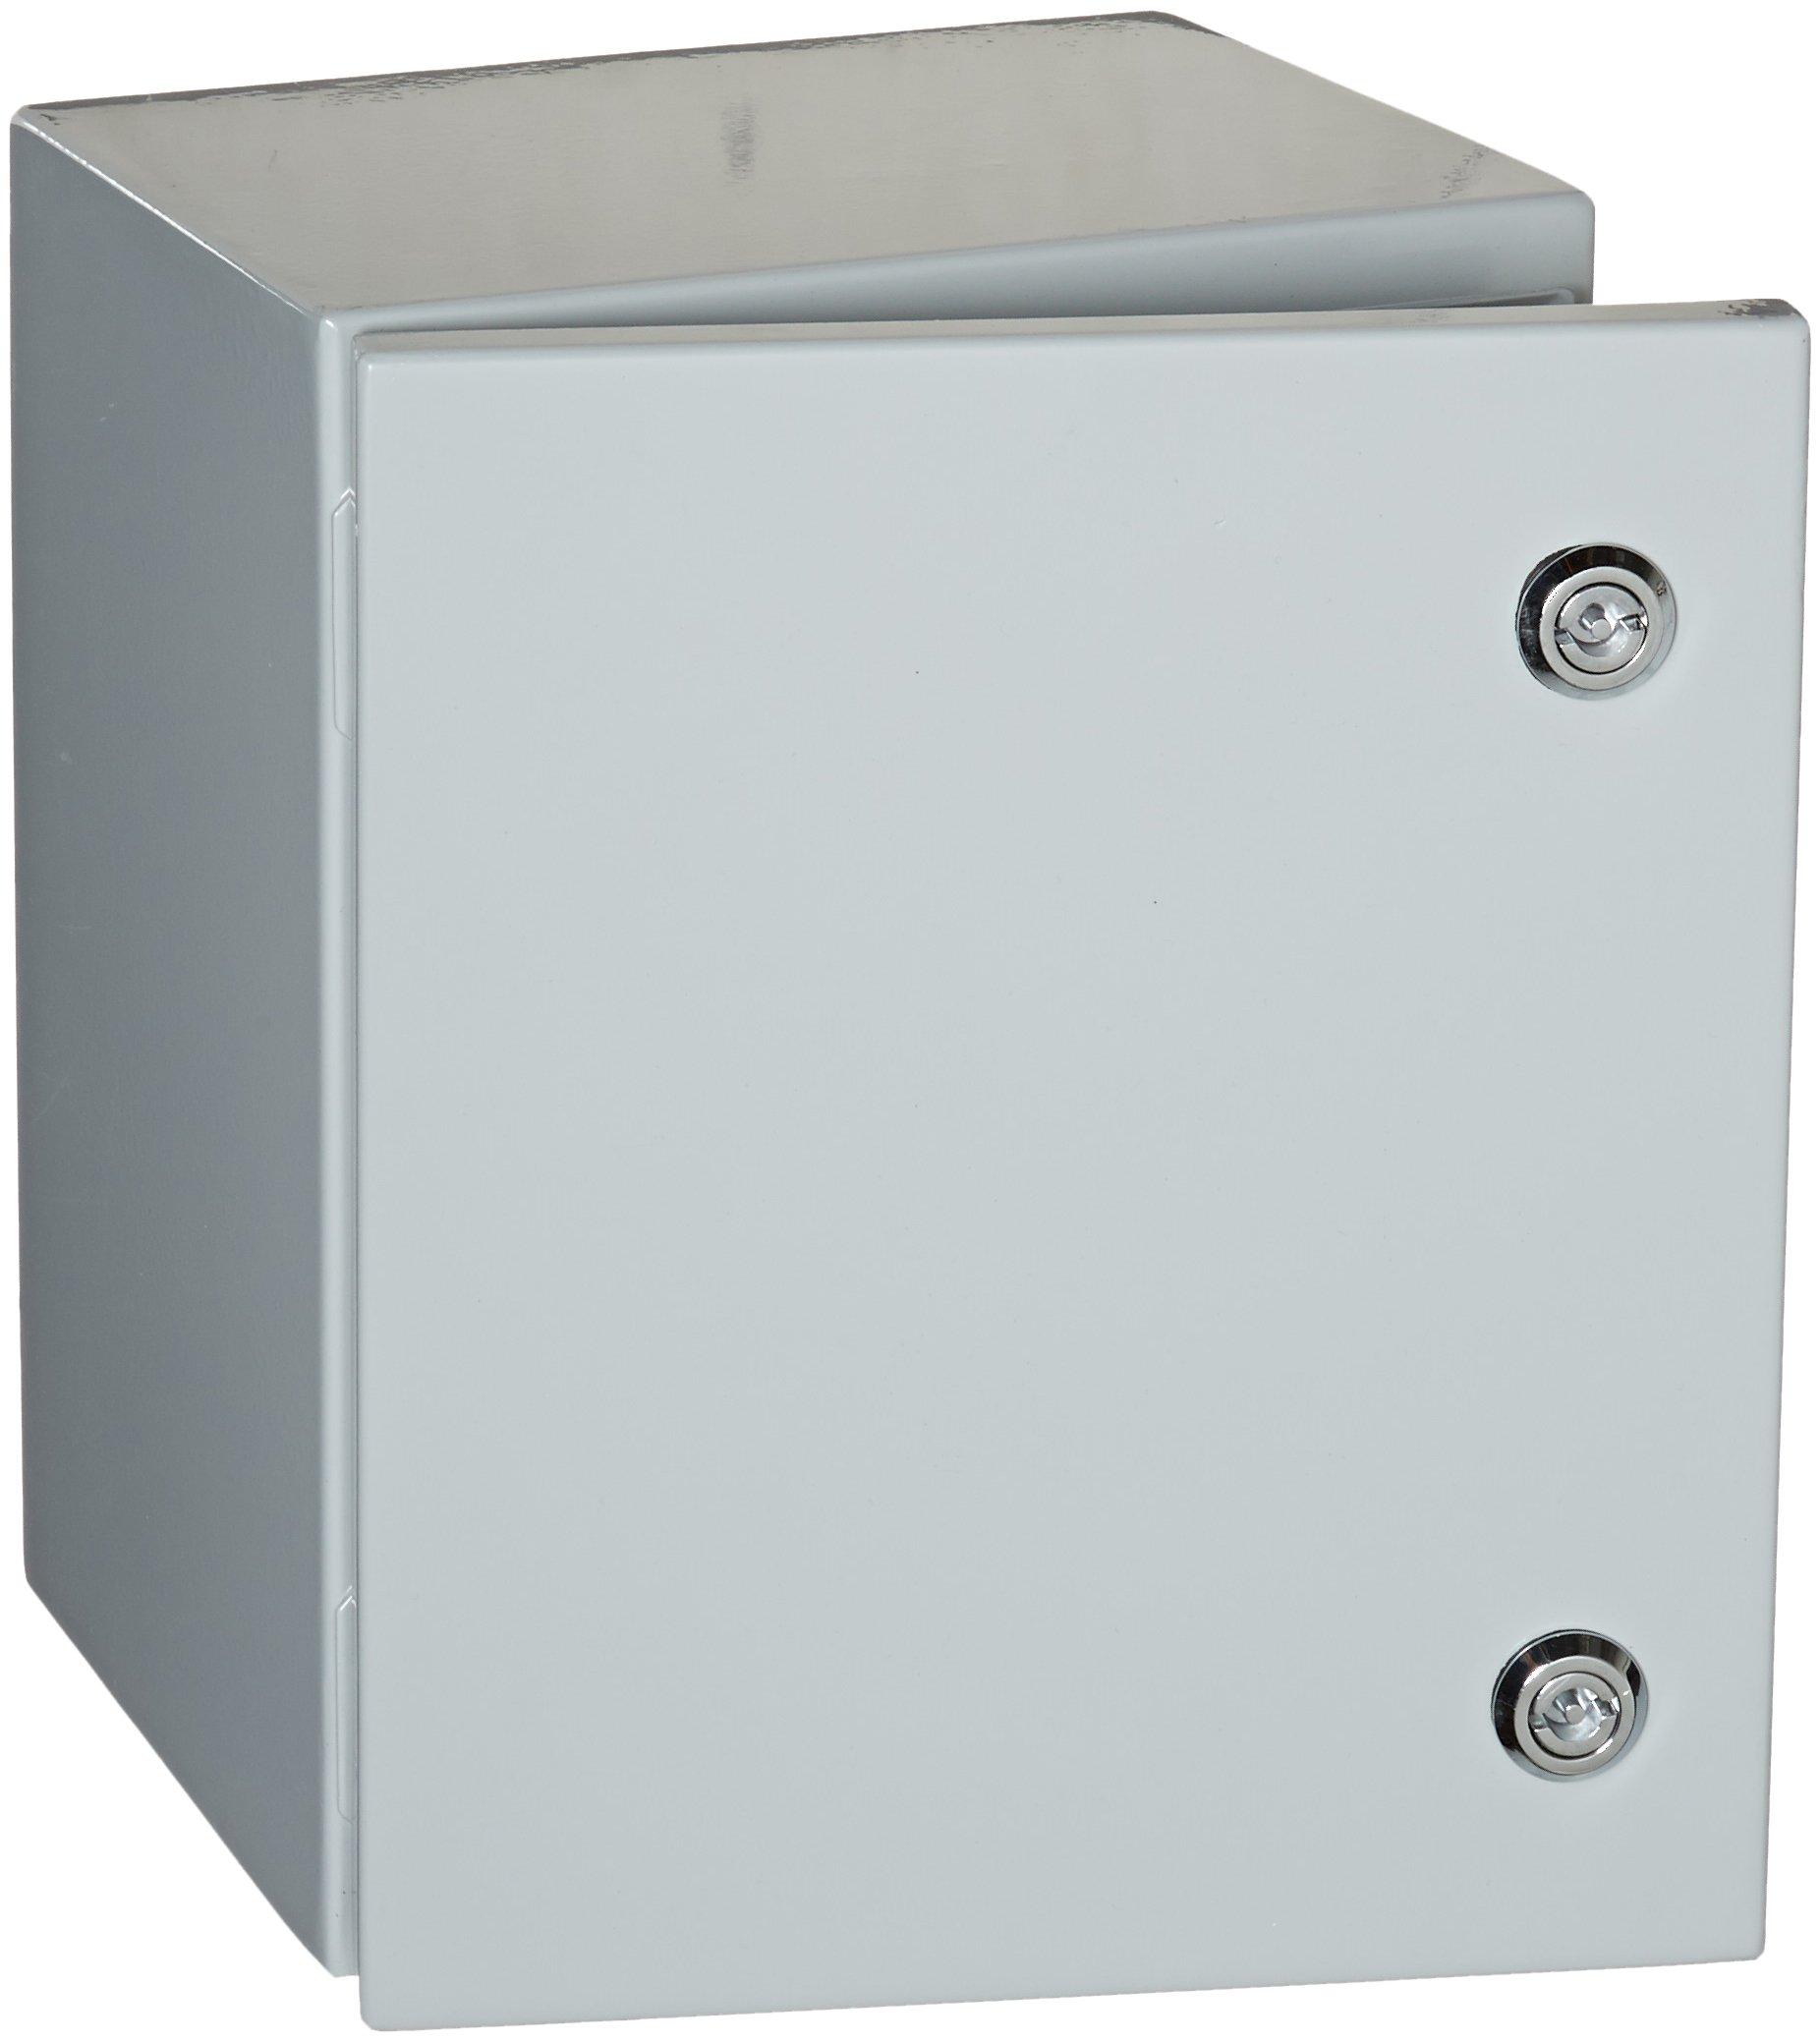 "BUD Industries Series SNB Steel NEMA 4 Sheet Metal Box with Mounting Bracket, 9-53/64"" Width x 11-51/64"" Height x 7-55/64"" Depth, Smooth Gray Finish"